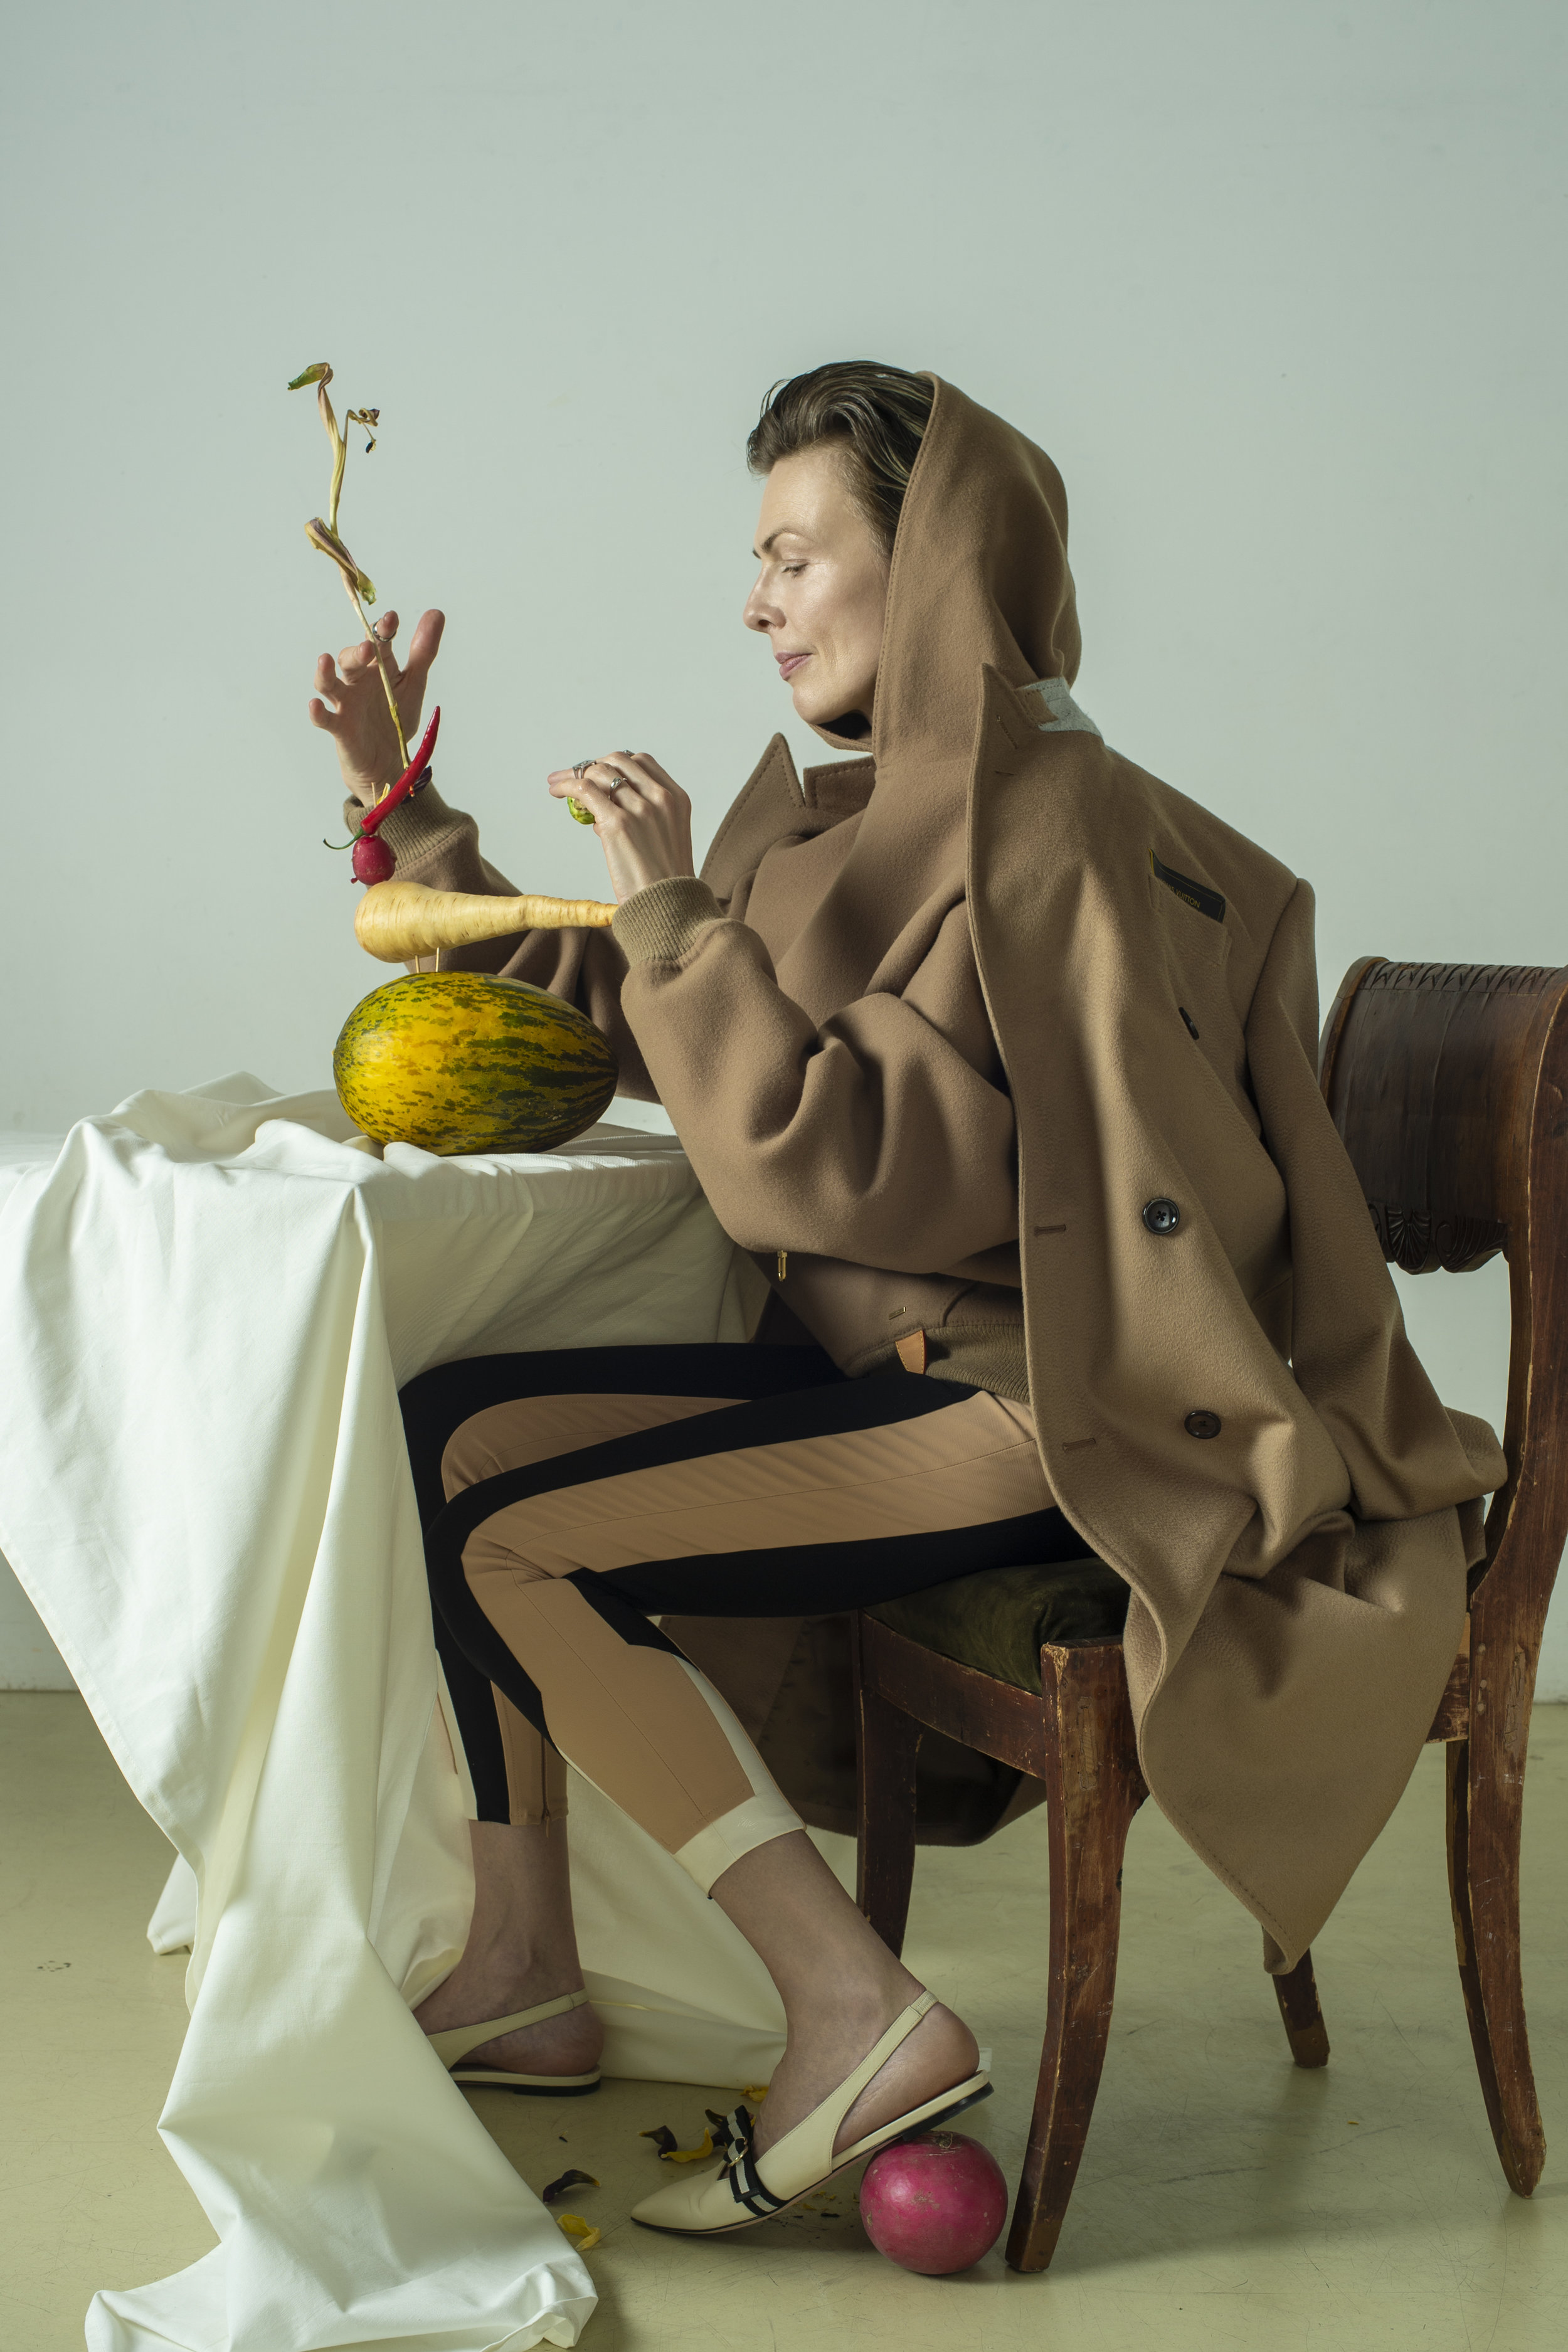 Hoodie, coat LOUIS VUITTON. Leggins ELISABETTA FRANCHI.  Shoes BALLY. Rings AVGVST